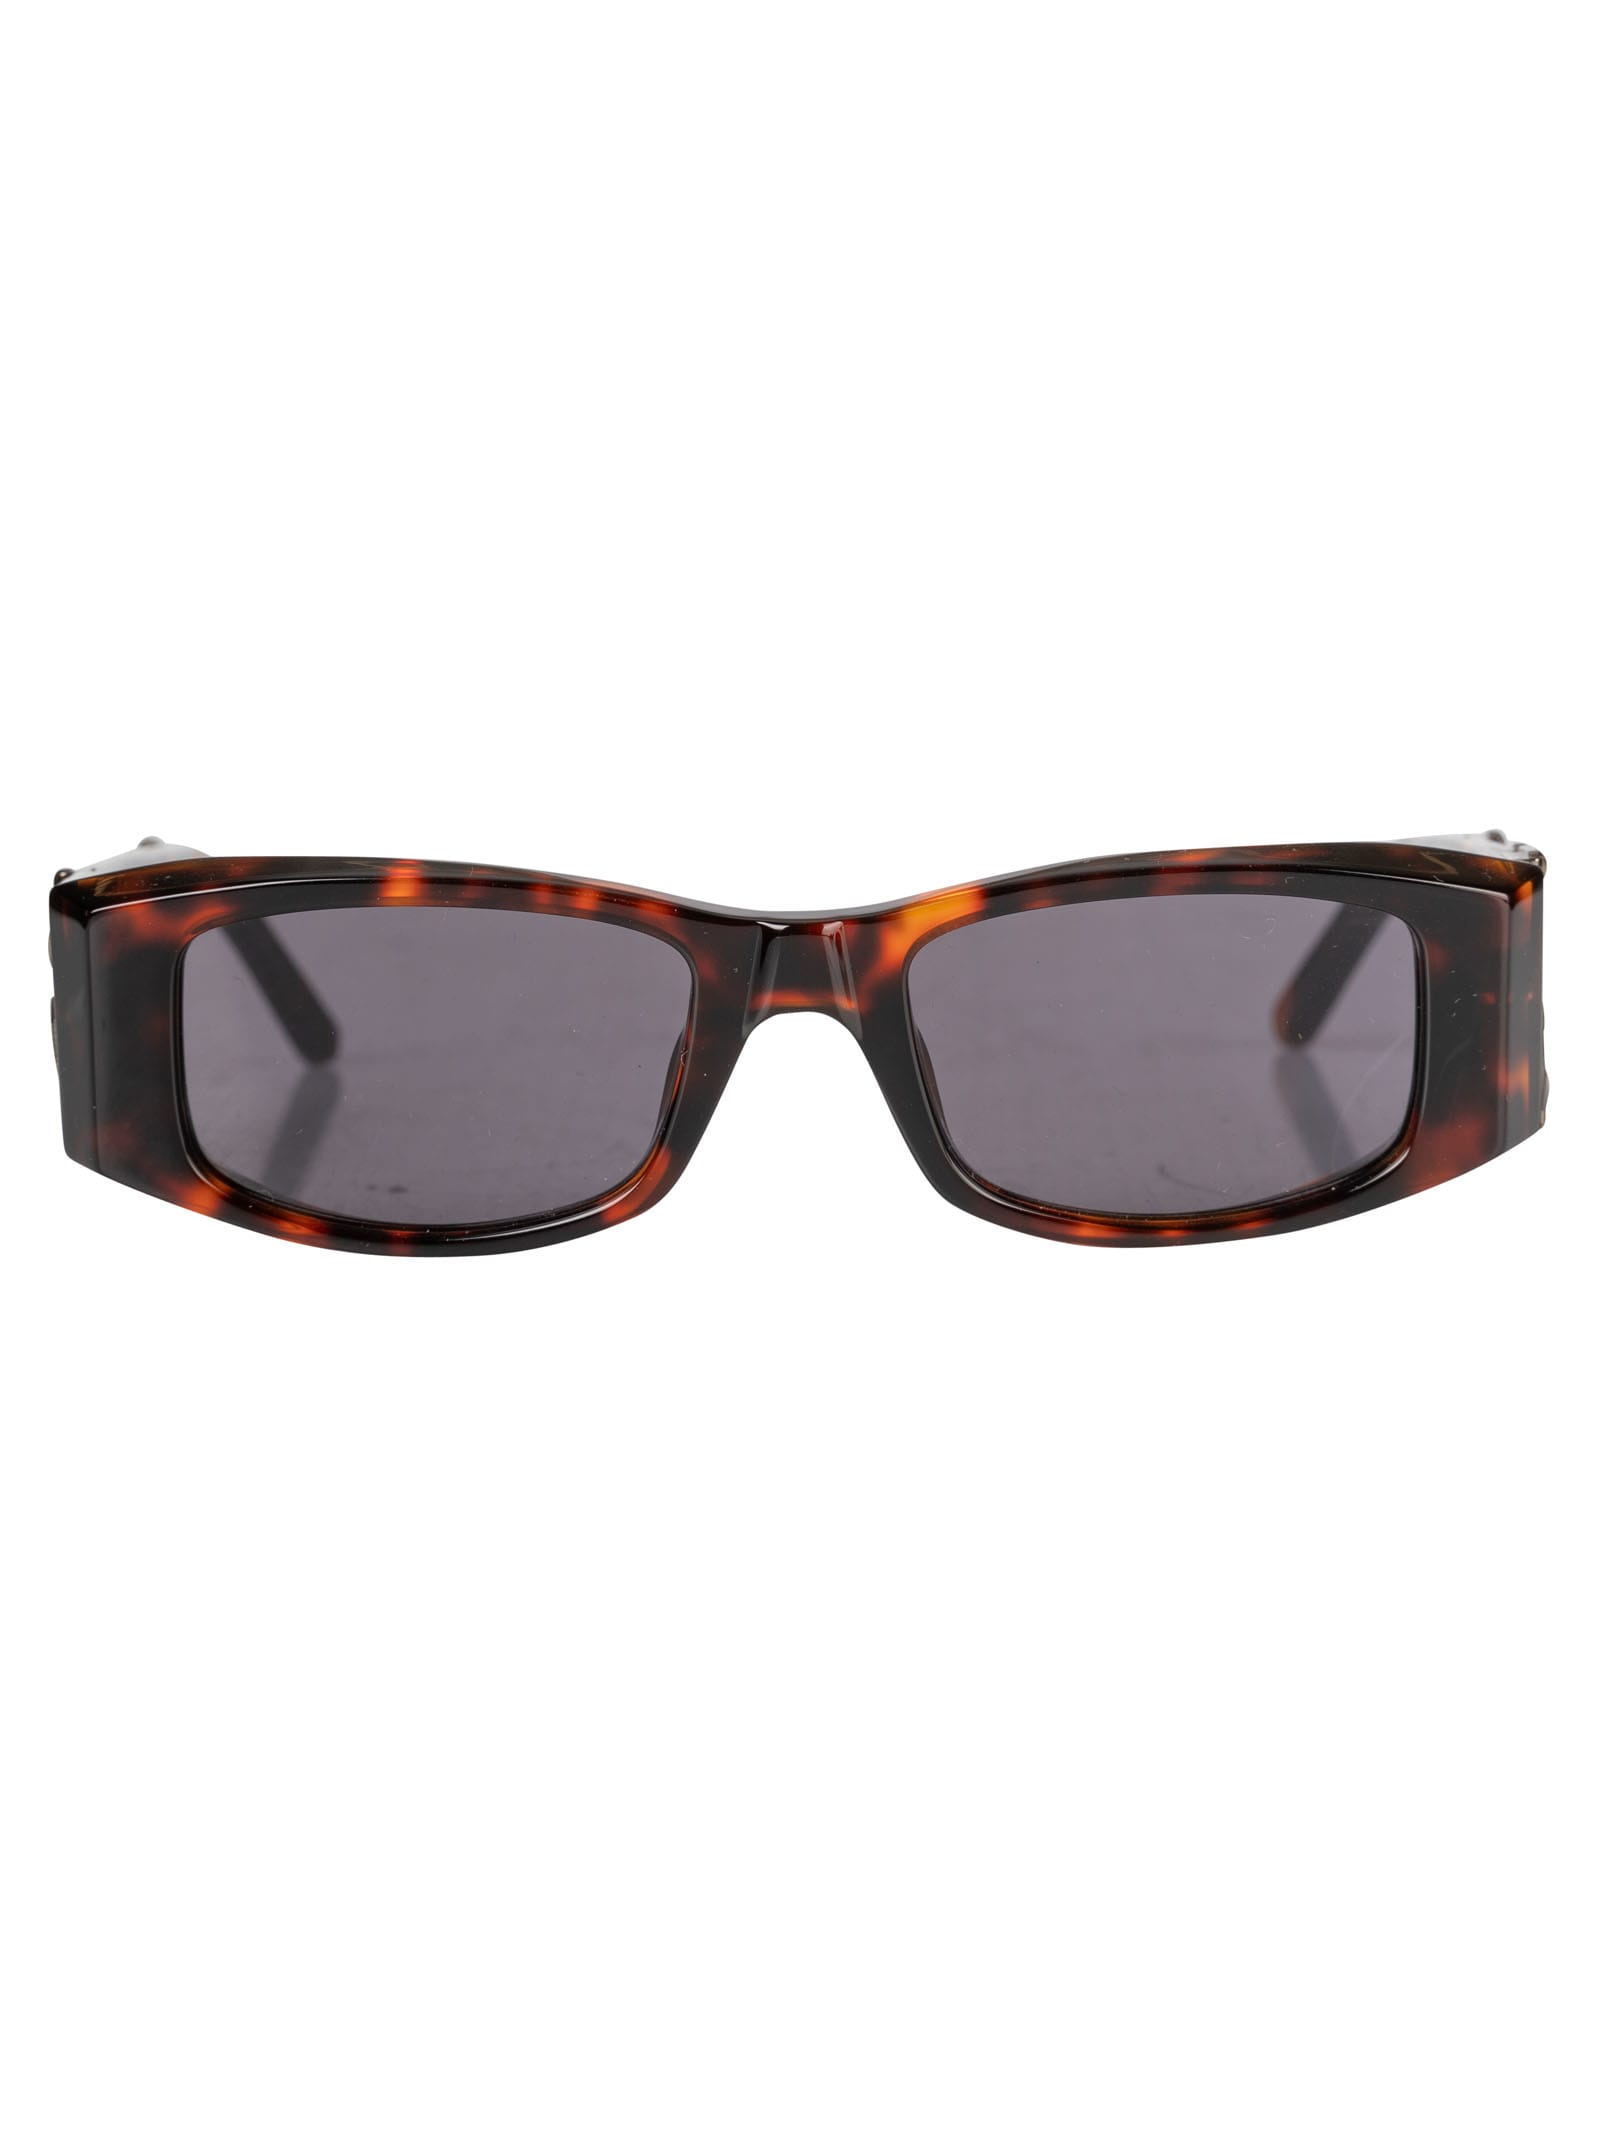 Palm Angels Pa01 Sunglasses In Brown/dark Grey